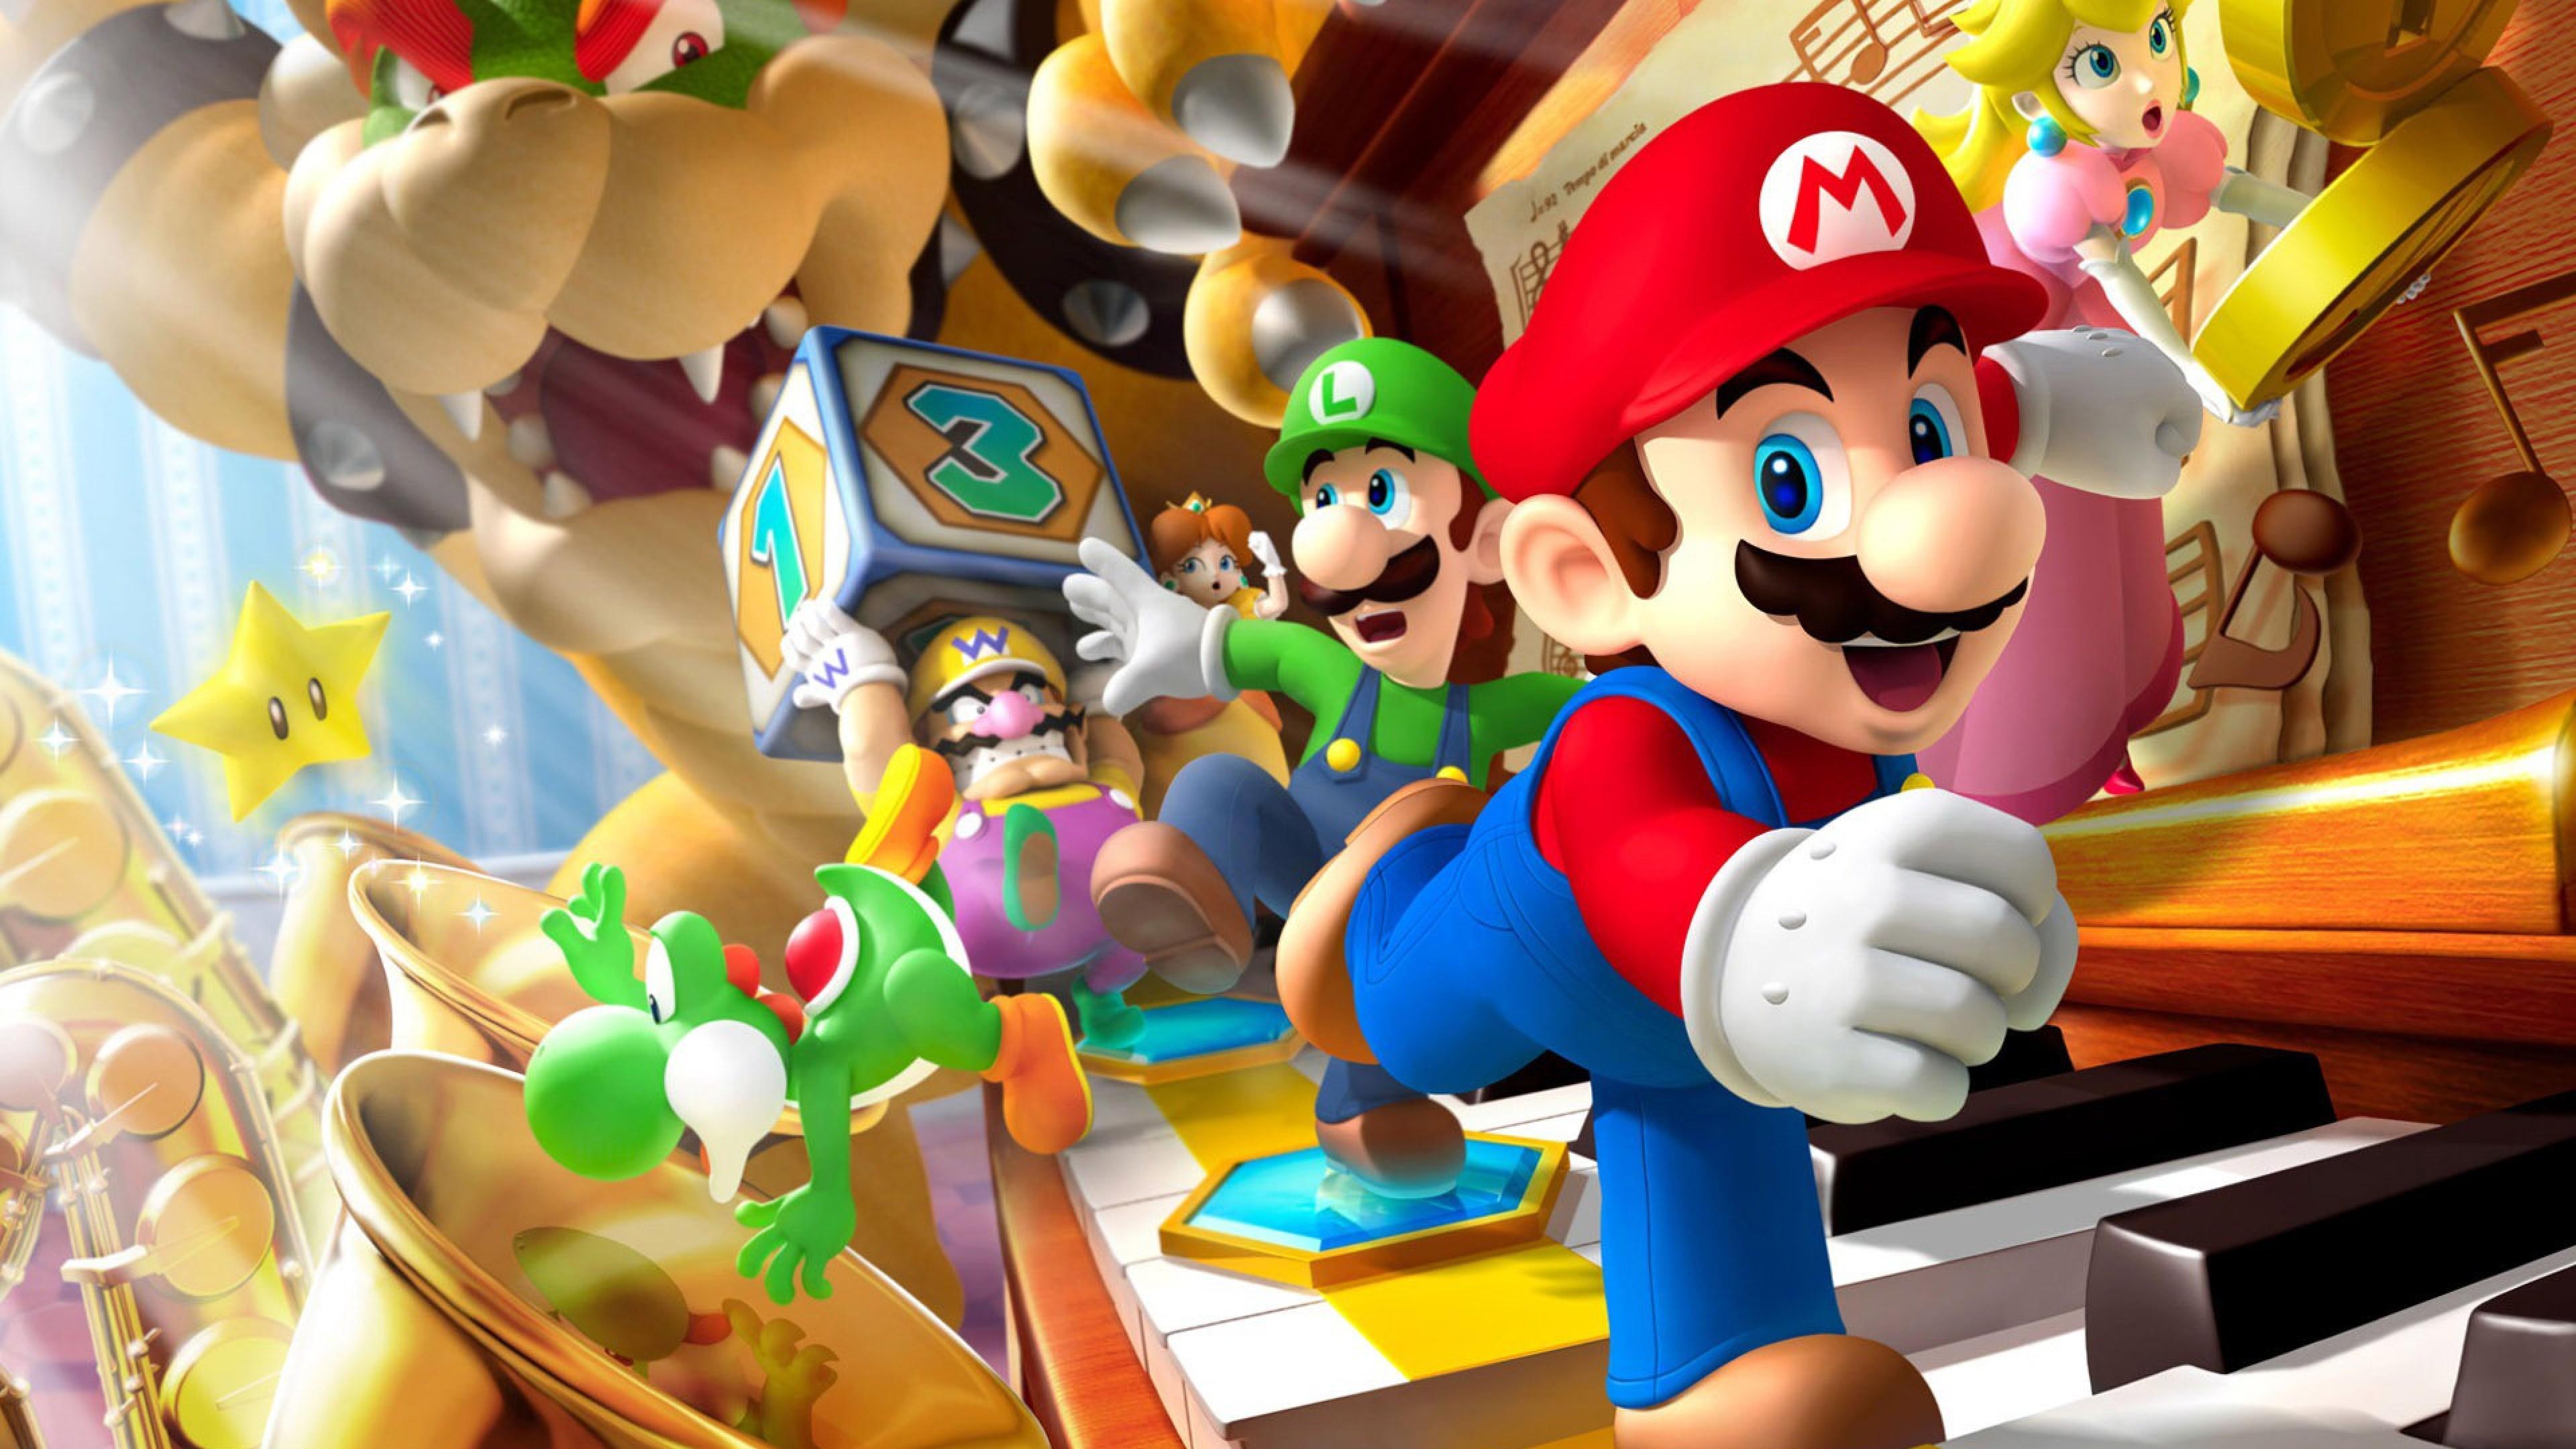 Cool Super Mario Hd Wallpaper For Desktop And Mobiles 4k